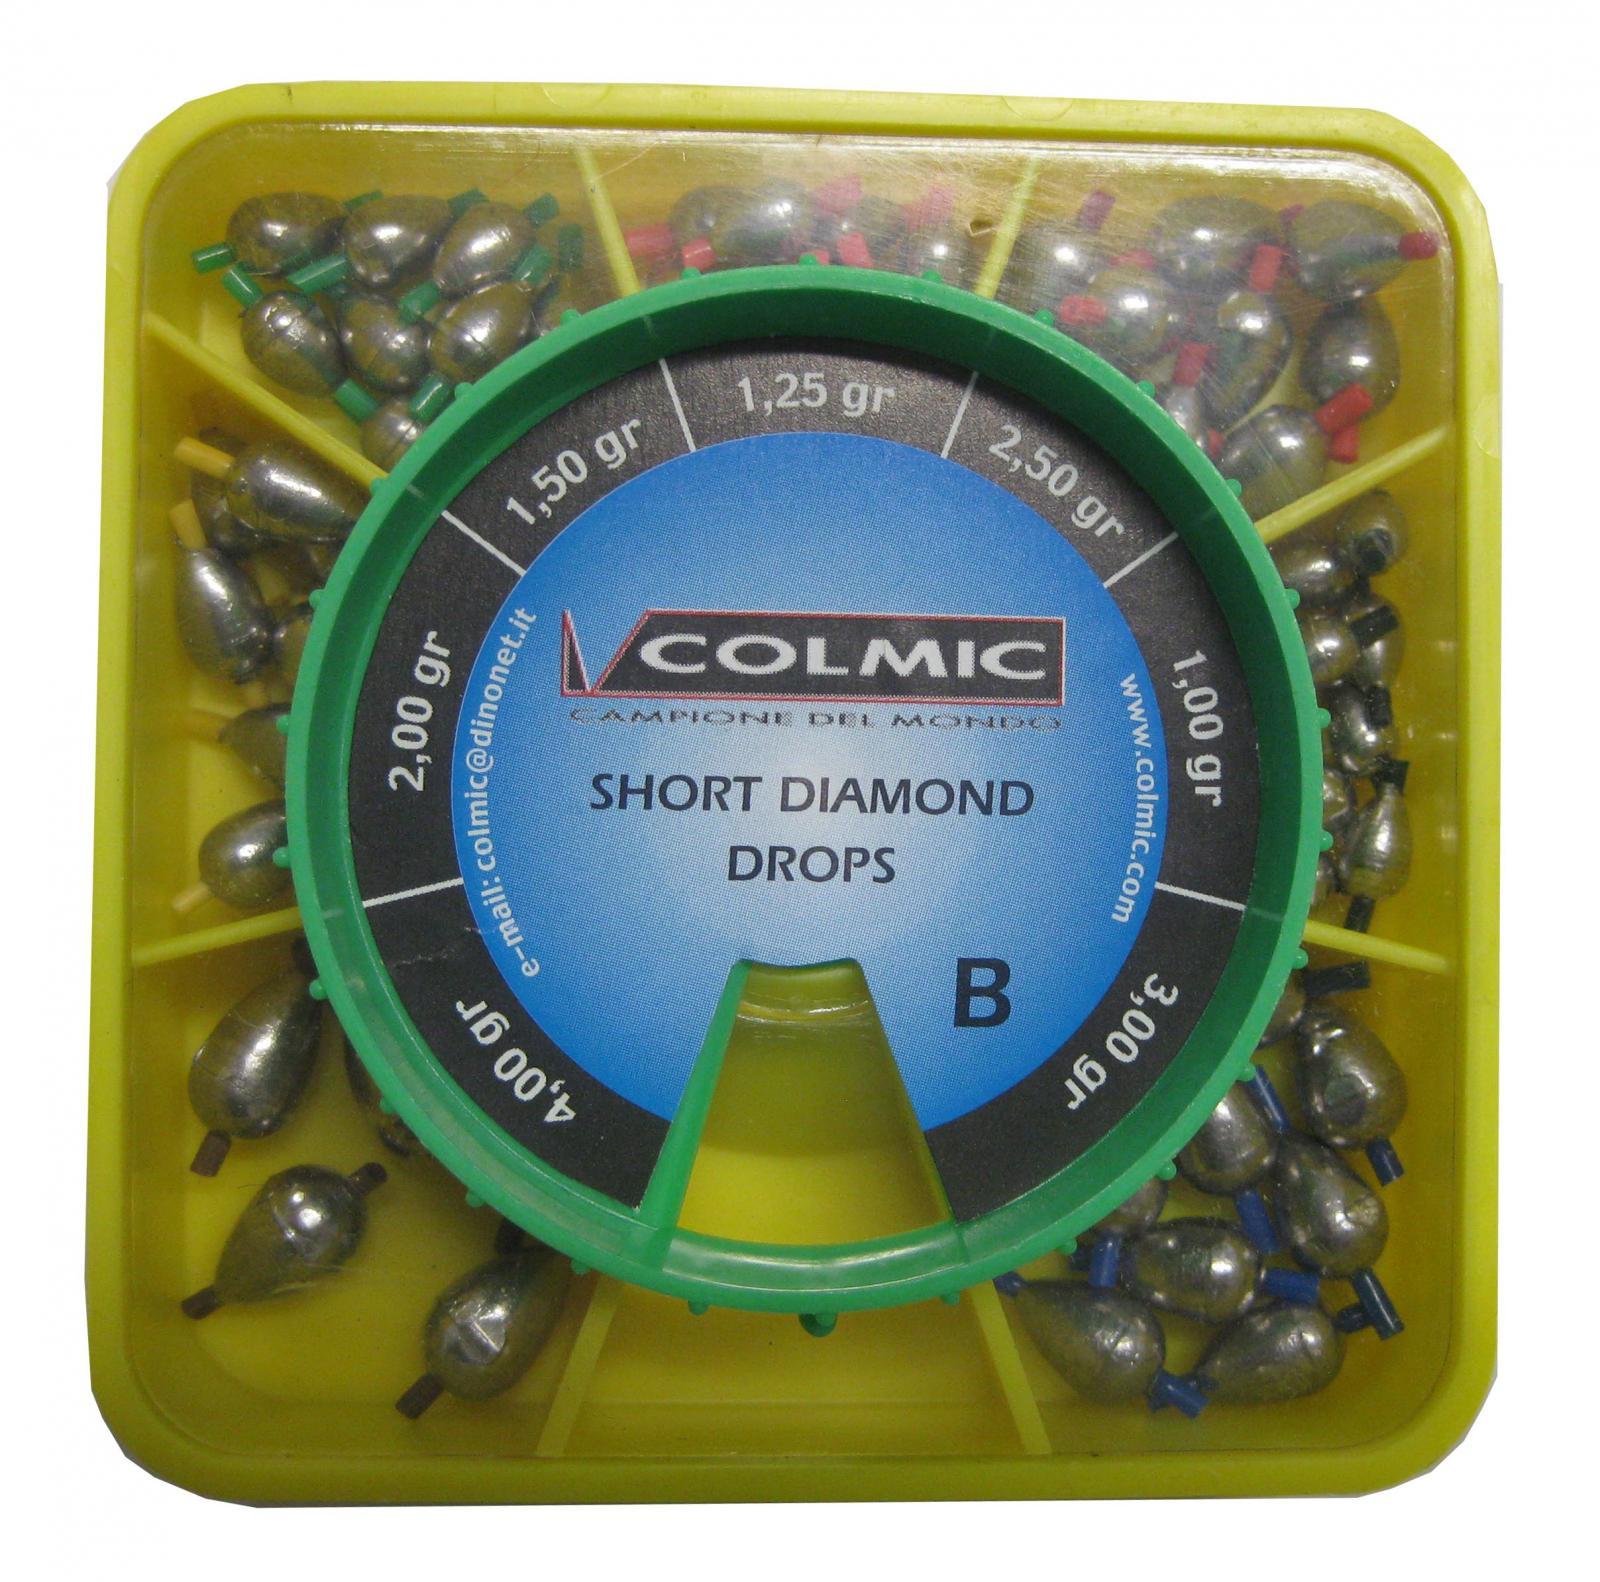 POMA02C Piombi Mascotte Pesca Torpille Colmic Long Diamond Box C 2-6 Gr FEU